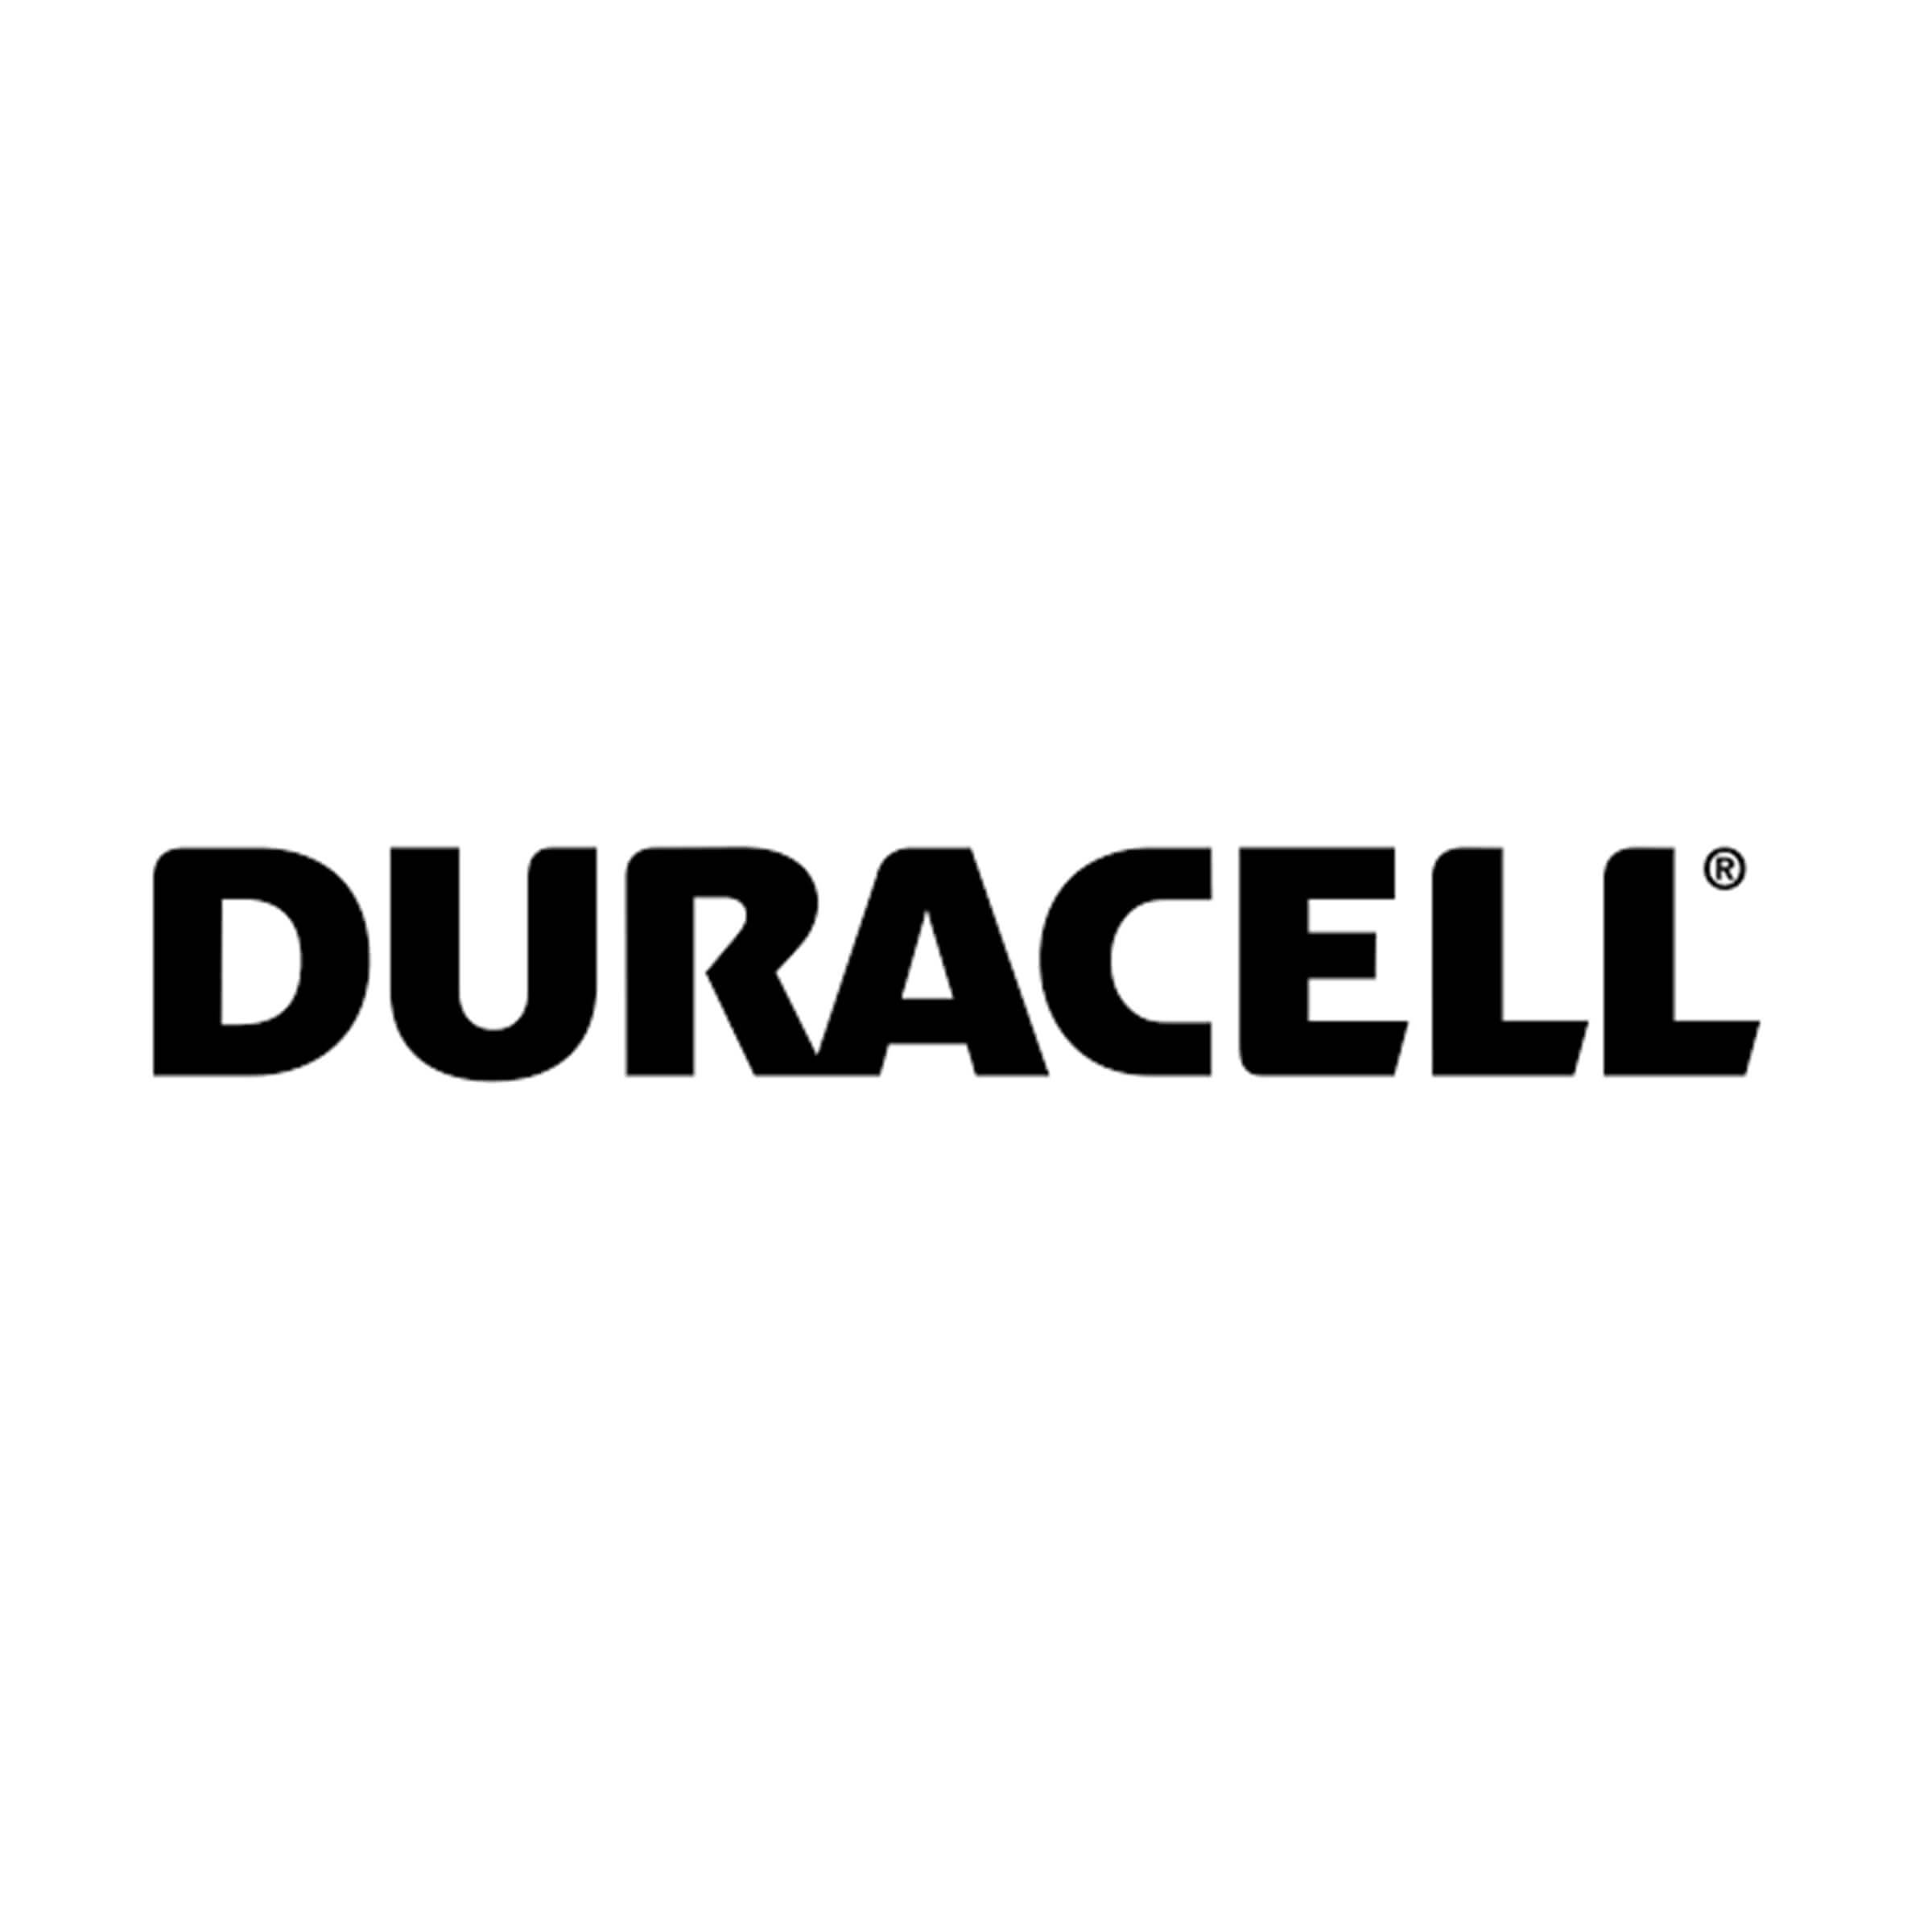 duracell_primary_attveldvc2ooe5oip